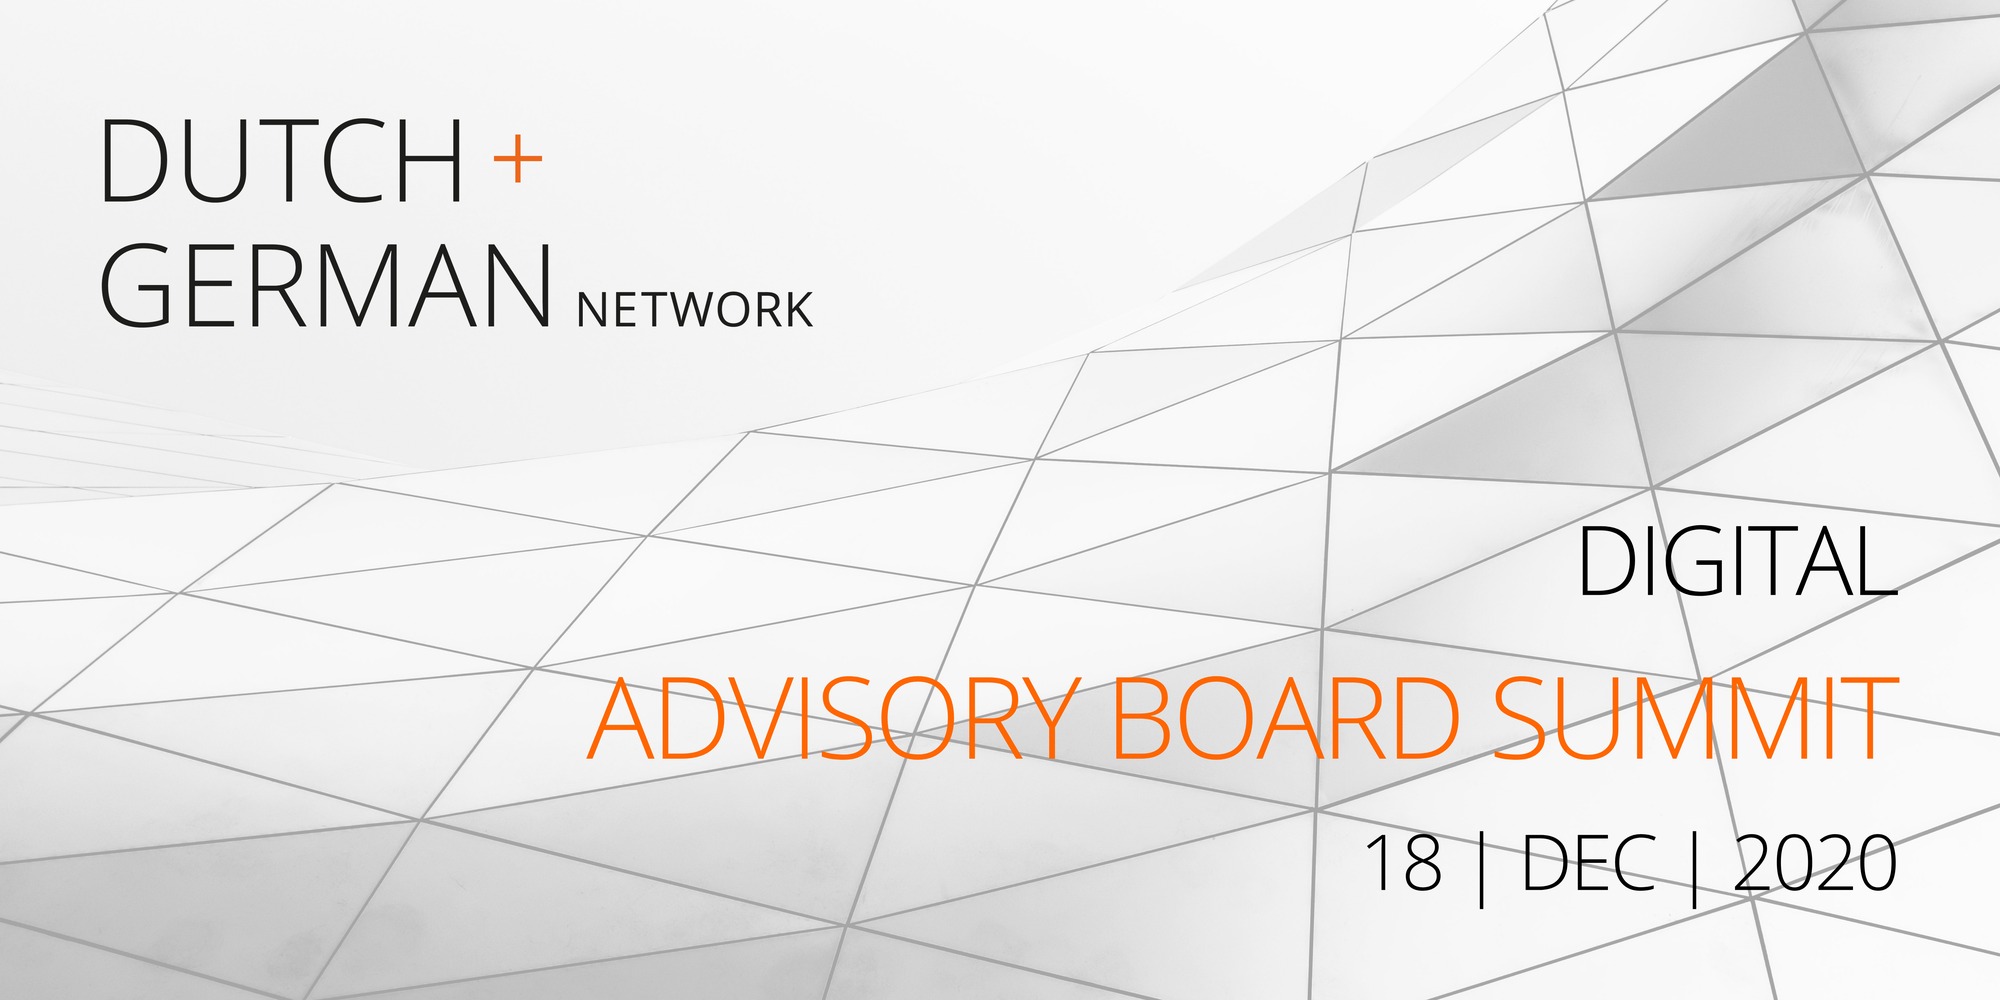 Digital Advisory Board Summit